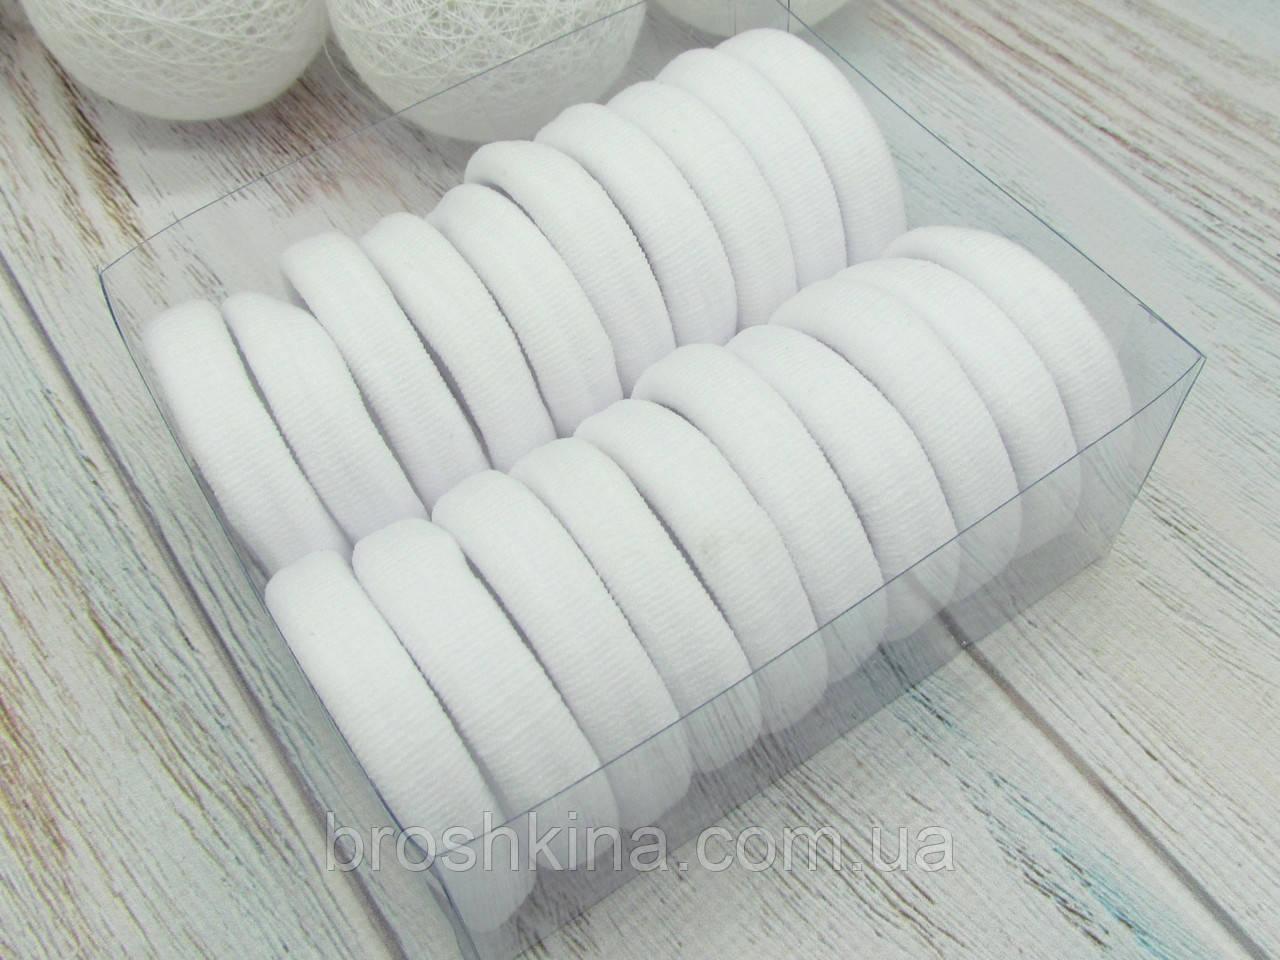 Резинки для волос Ø5 см микрофибра 20 шт. в коробочке